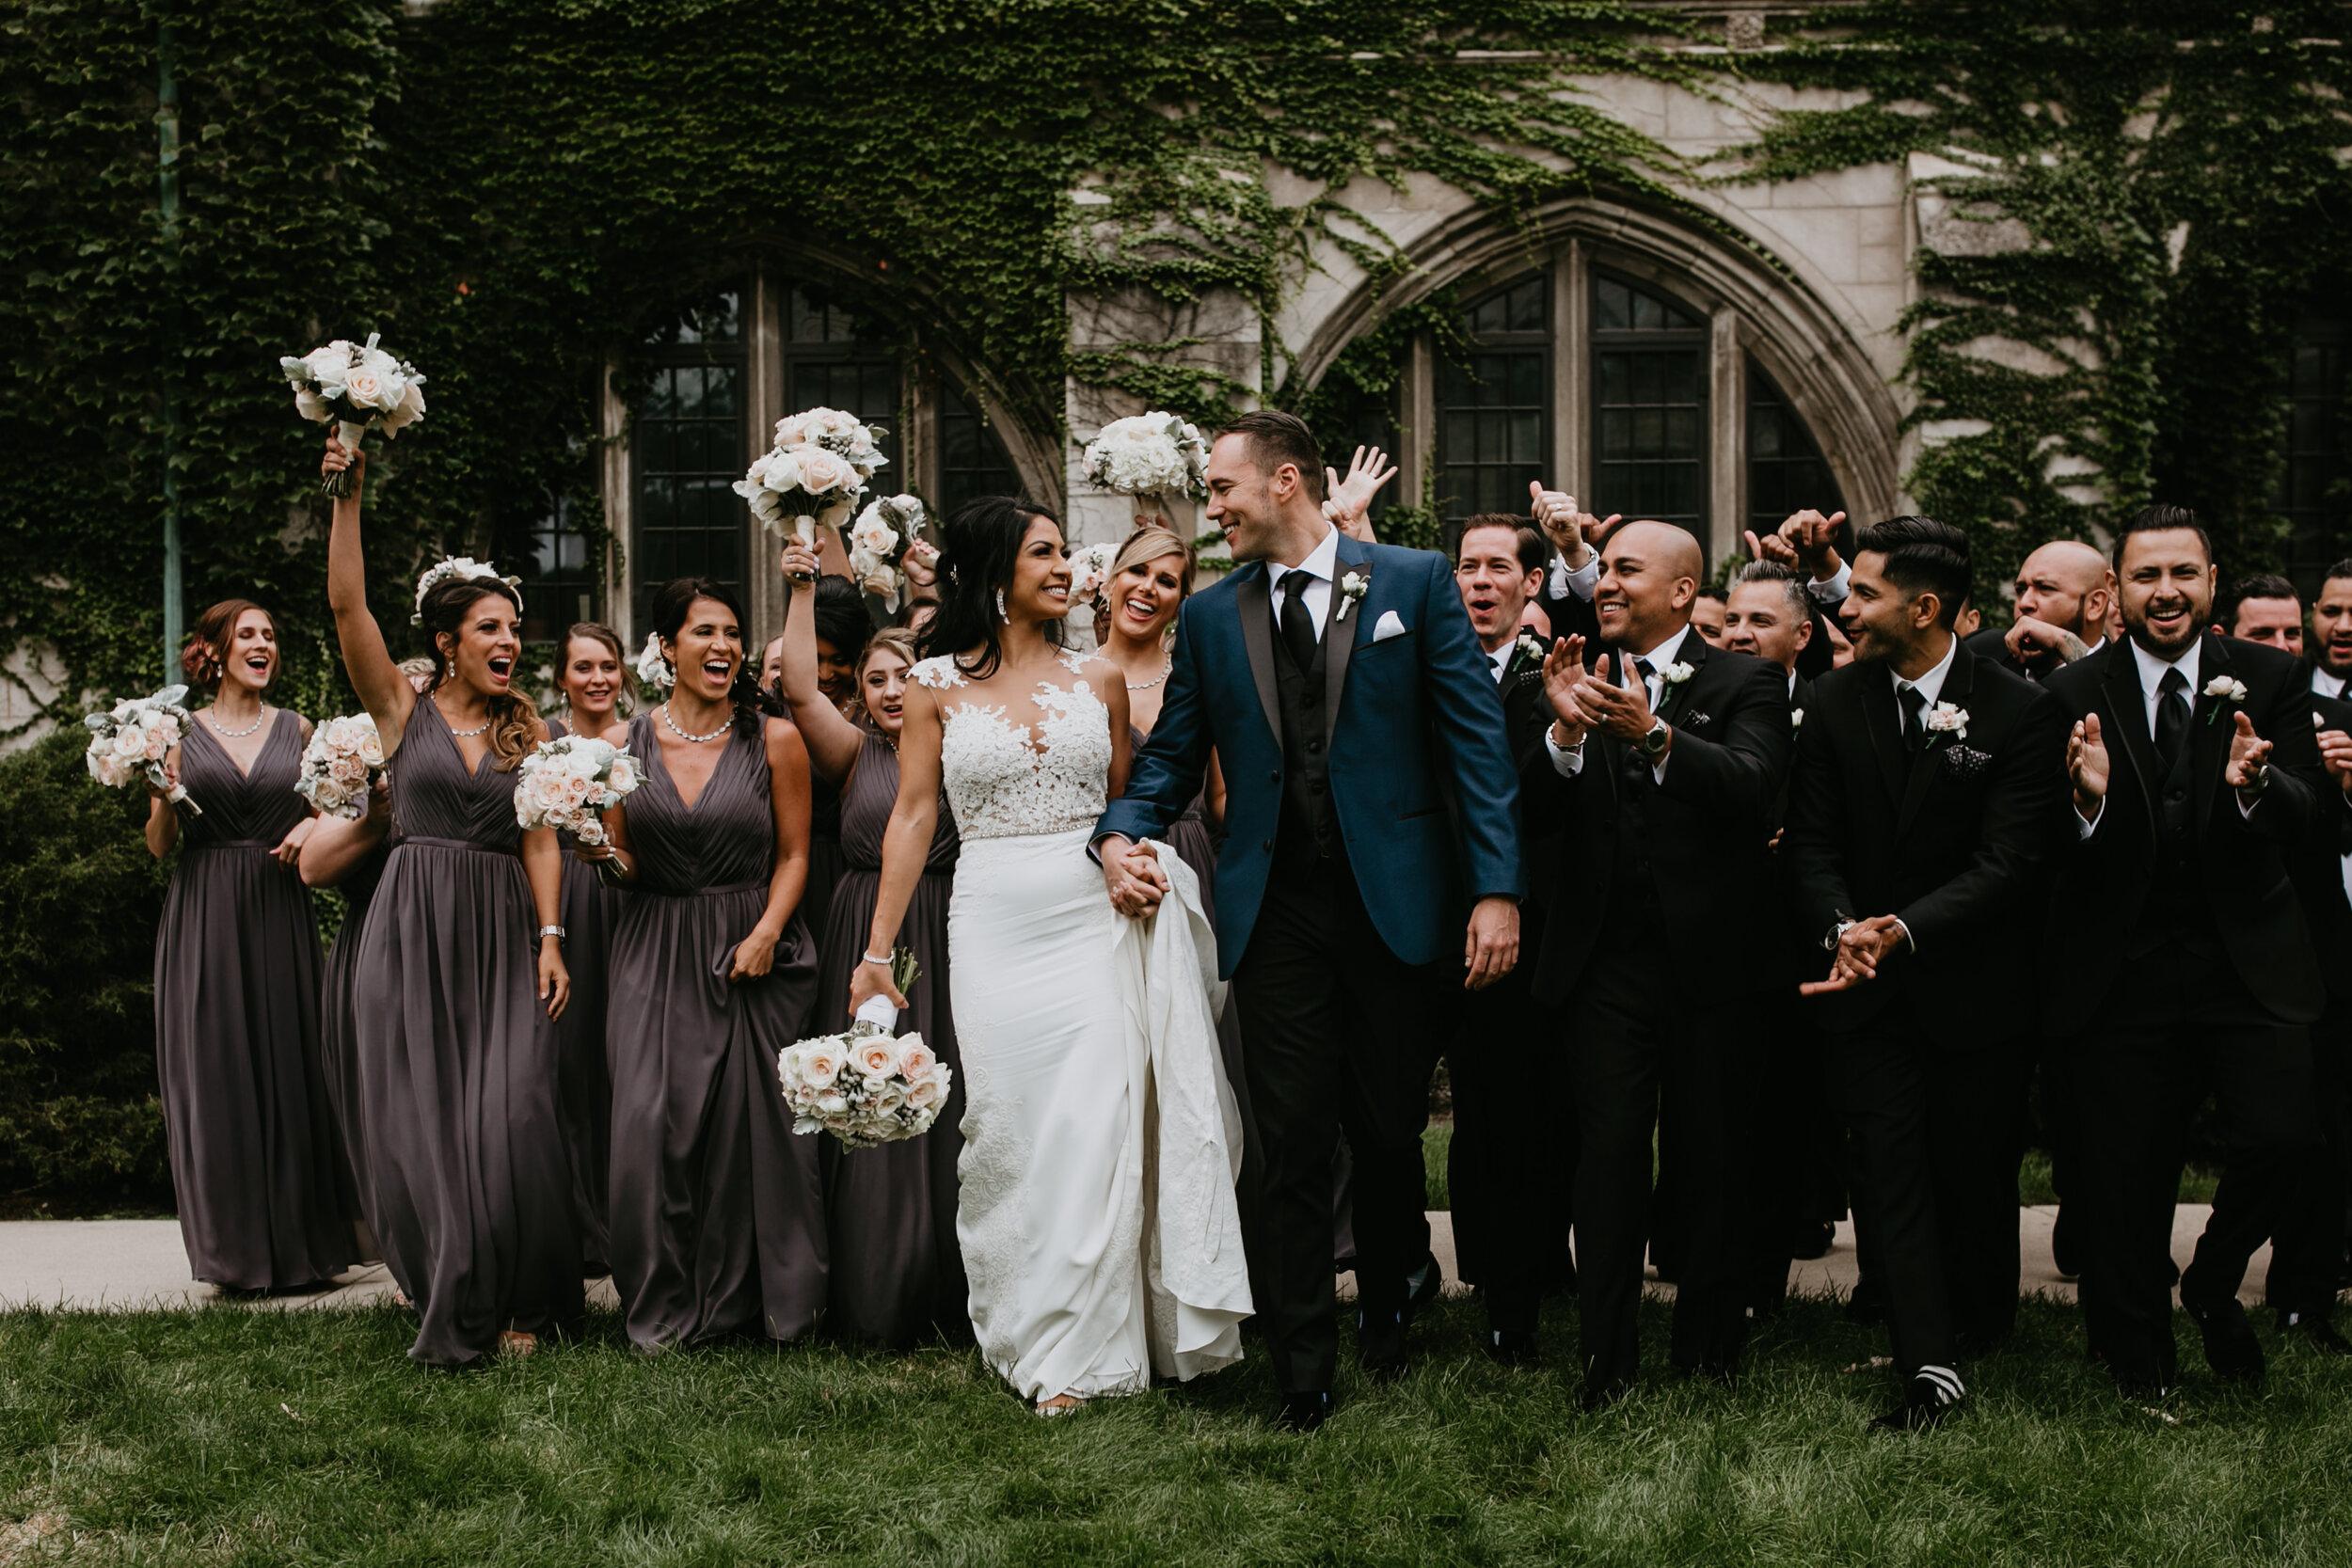 gordon wedding-277.jpg